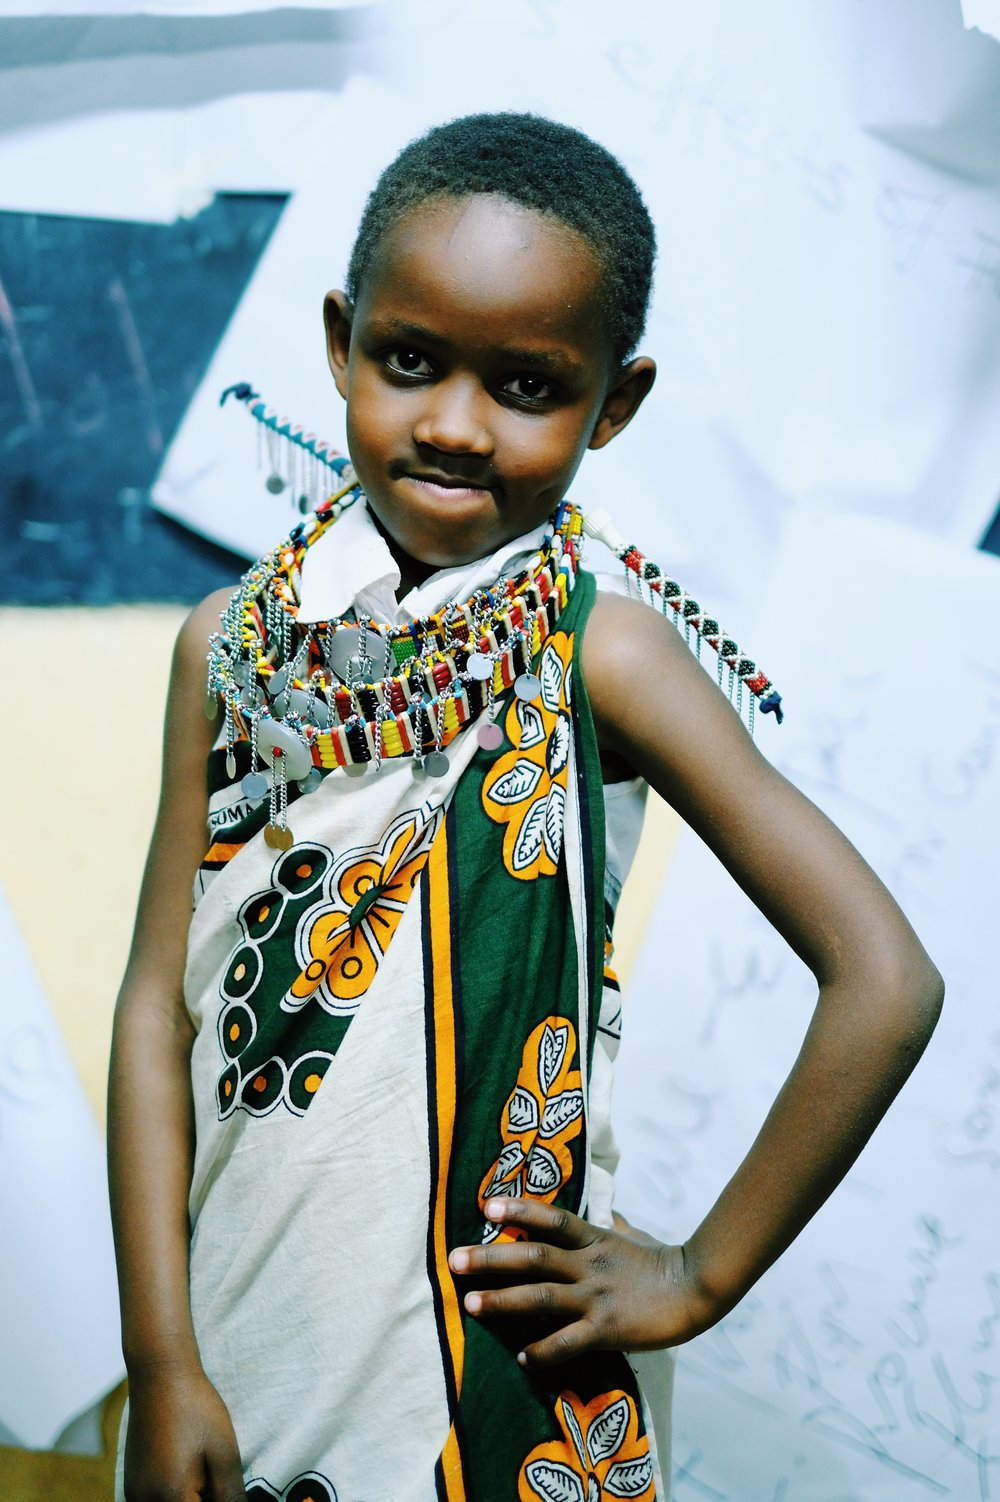 Maasai Olentoko 'End FGM' Beauty Pageant 5 by Joost Bastmeijer.jpeg